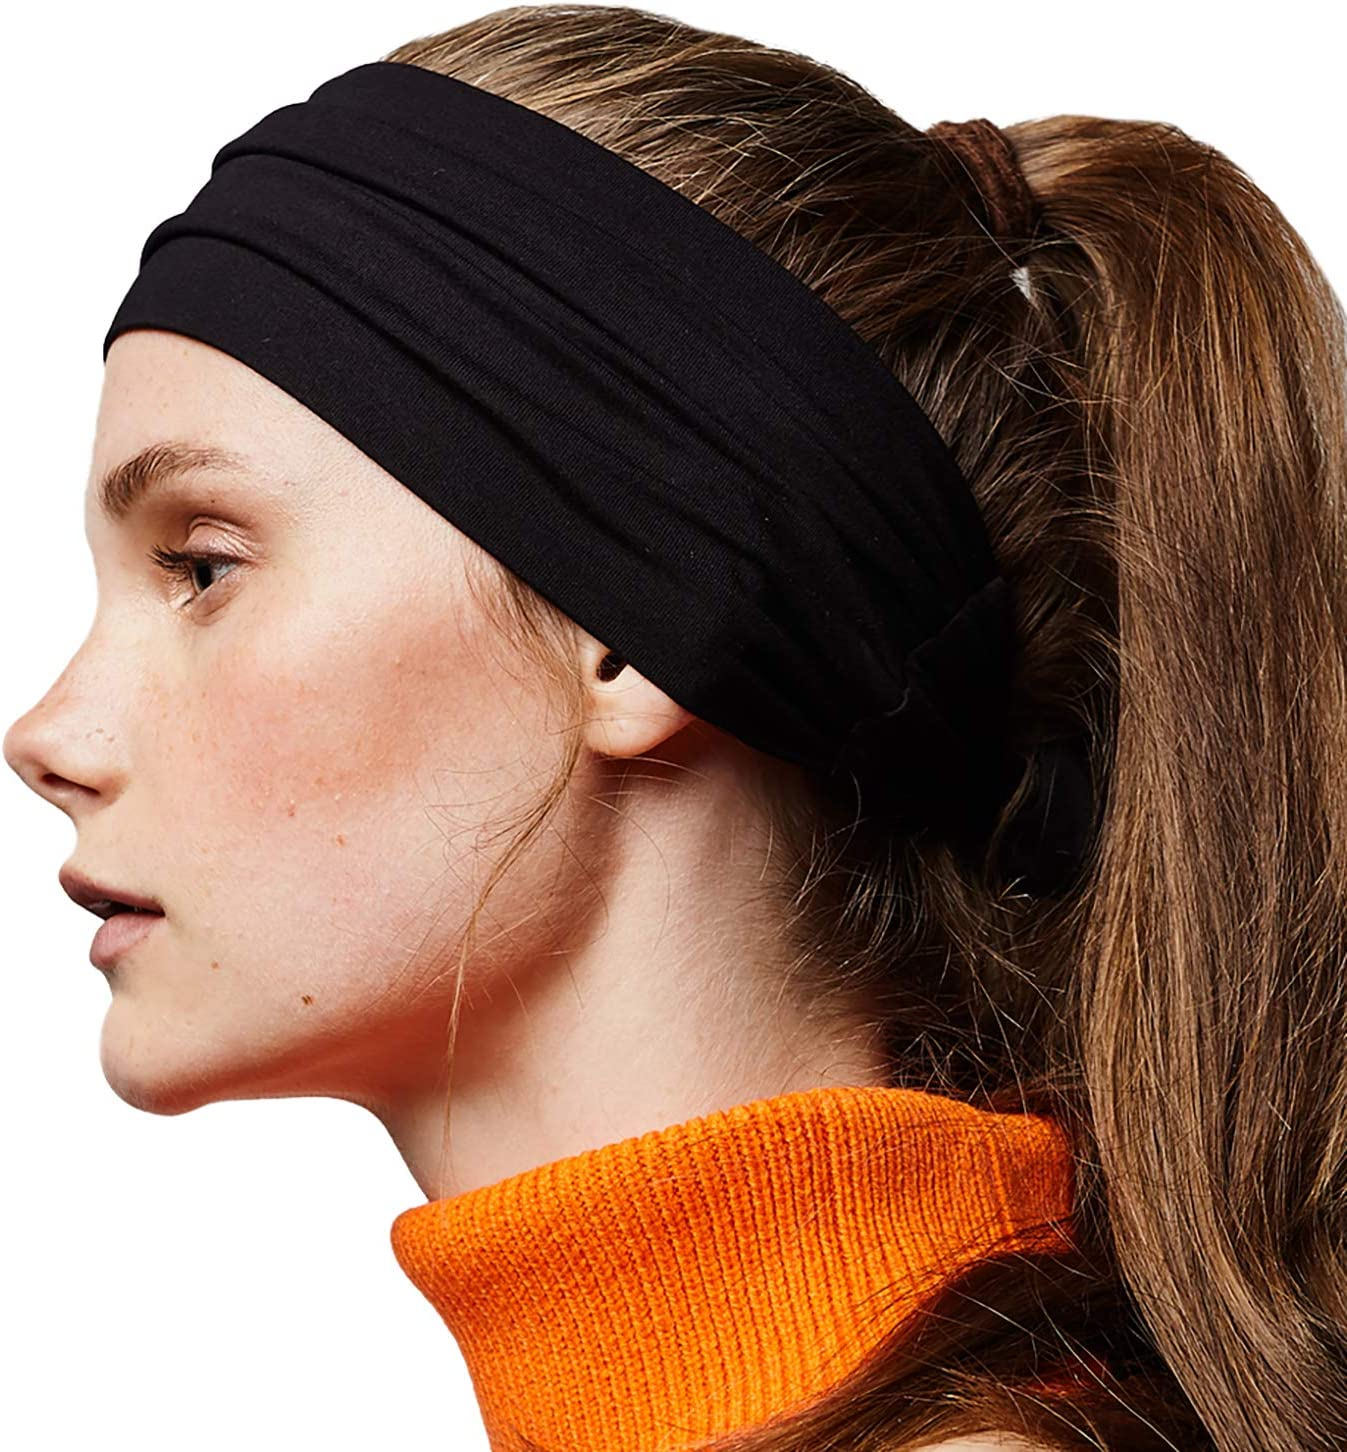 Tie Up Head Wrap Headband for Sports BLOM Beau Tie Adjustable Headband and Fashion. Running Yoga for All Head Sizes